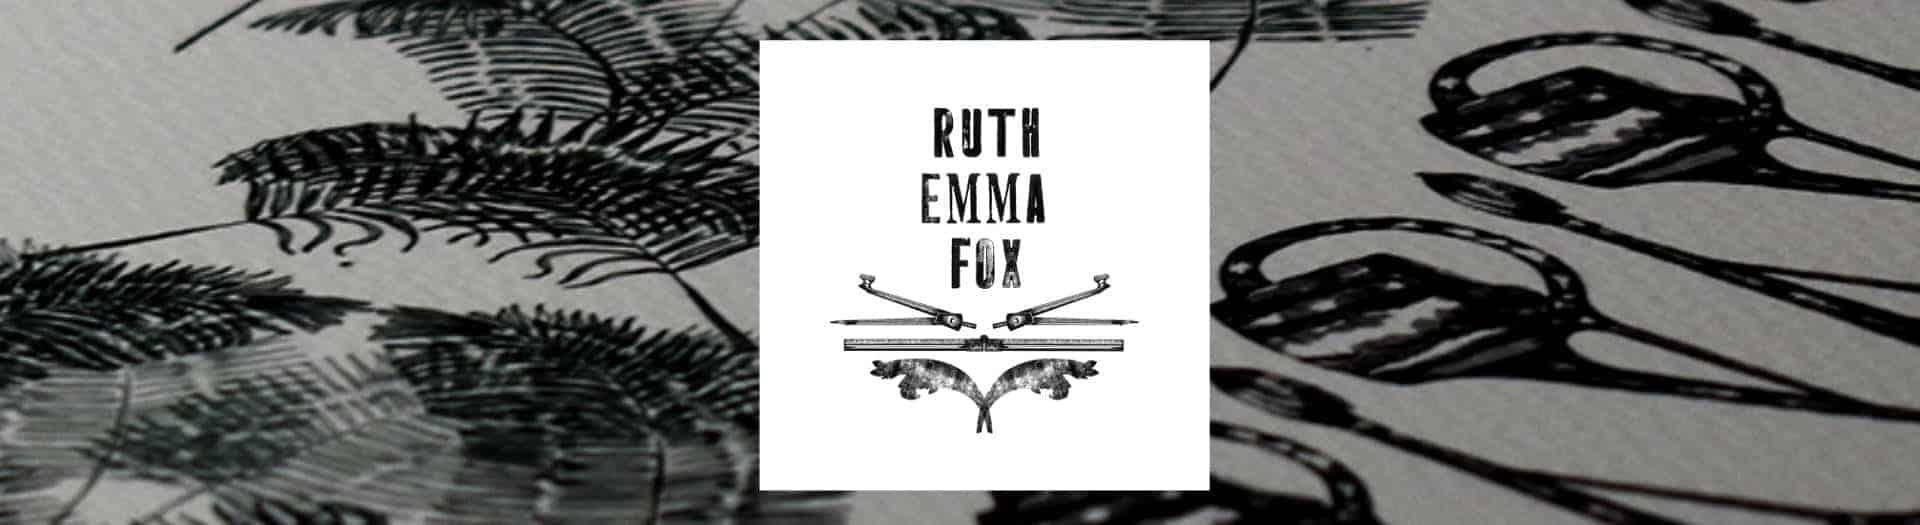 1920x525 Ruth Emma Fox 2 header with logo